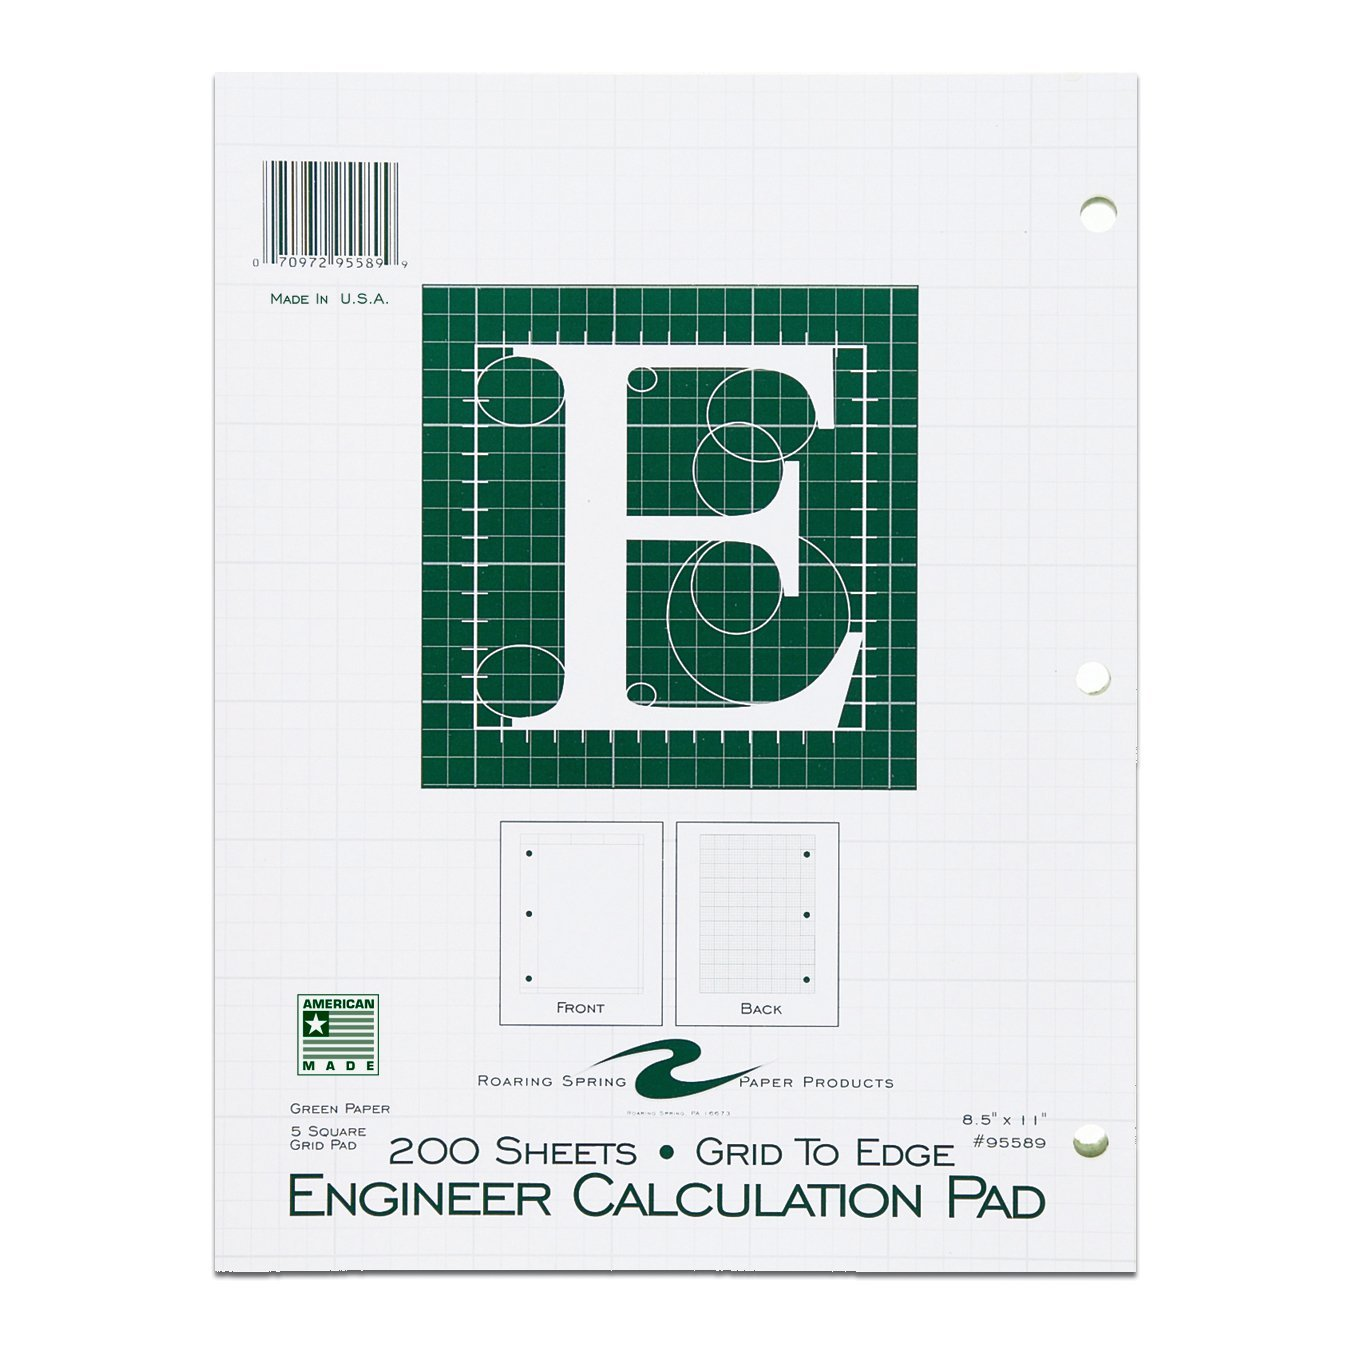 ENGINEER CALCULATION PAD 200 SHEETS